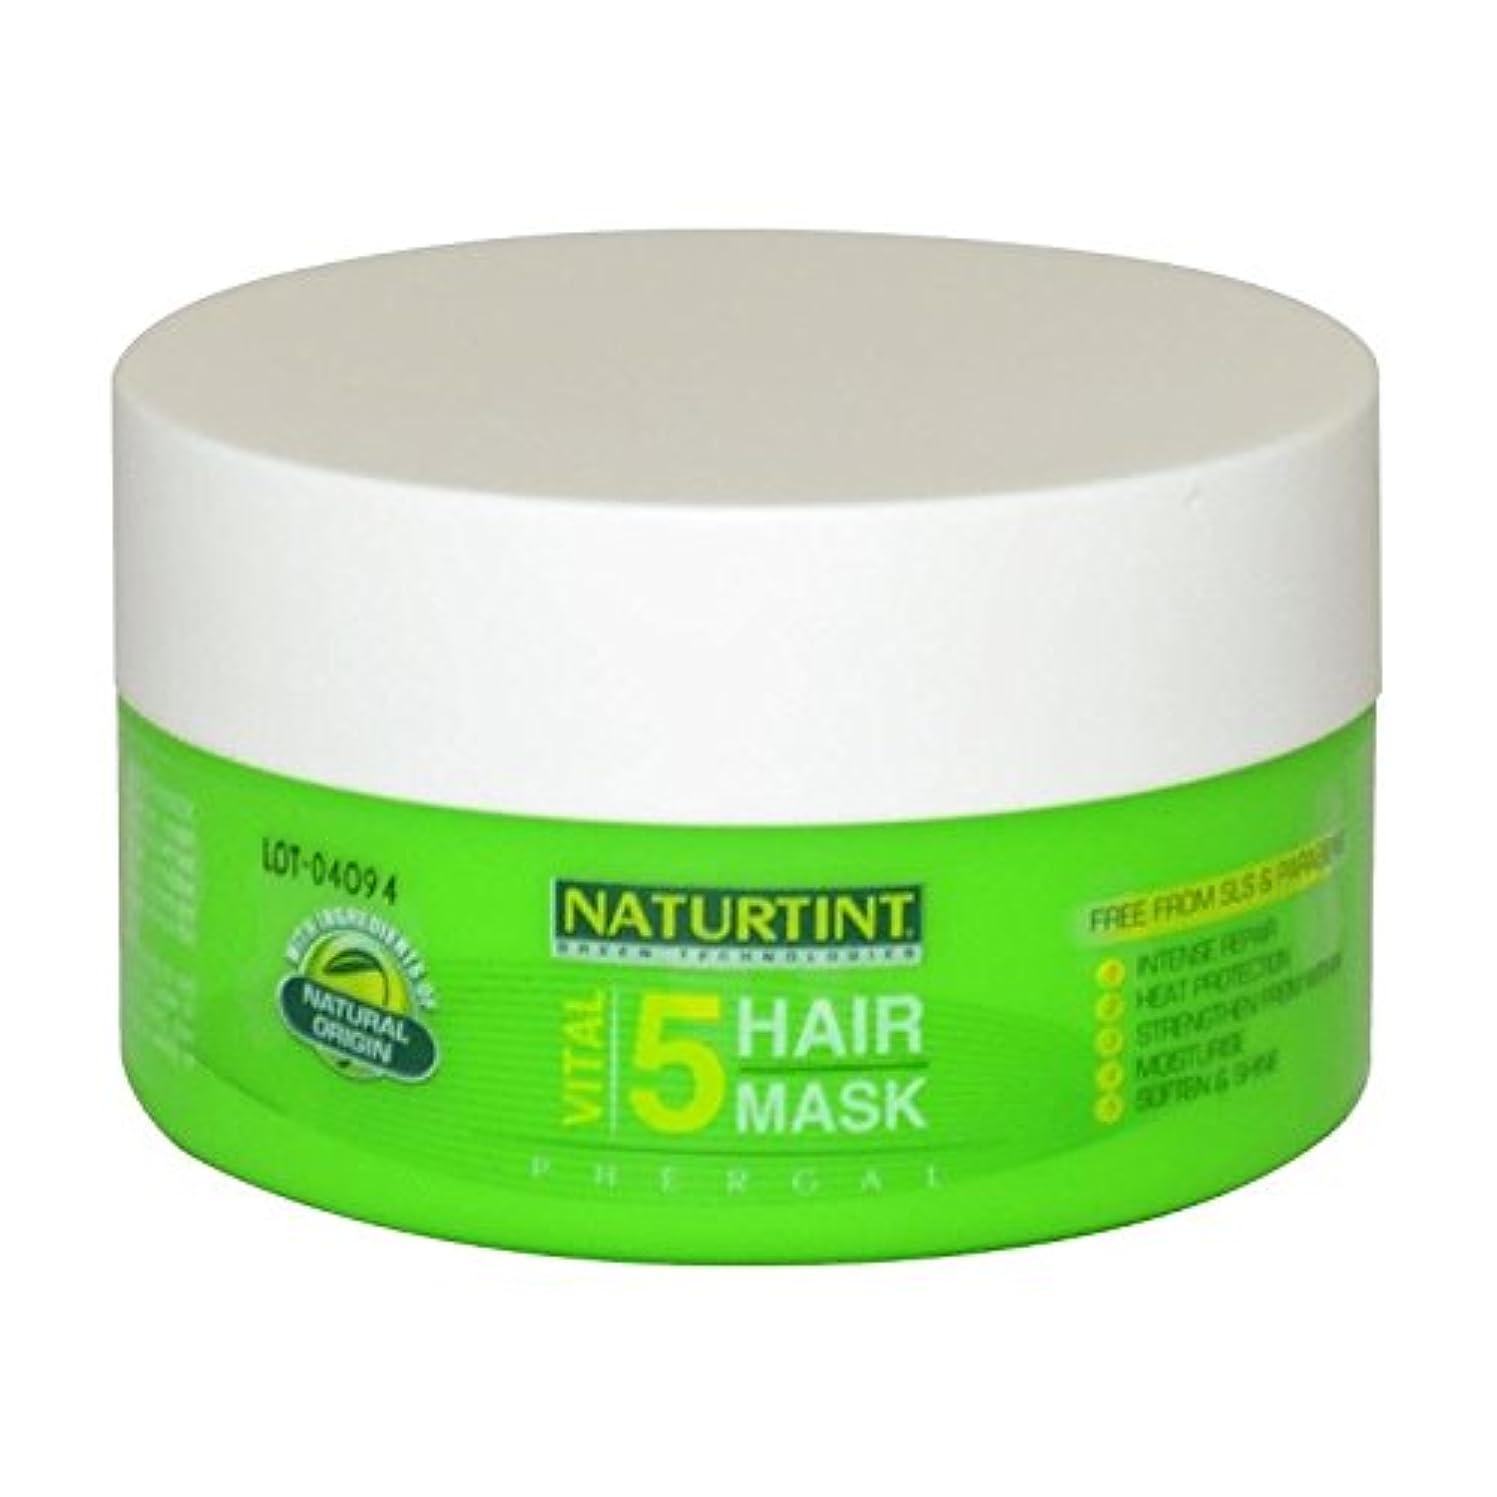 [Naturtint] Naturtint重要な5ヘアマスク - Naturtint Vital 5 Hair Mask [並行輸入品]